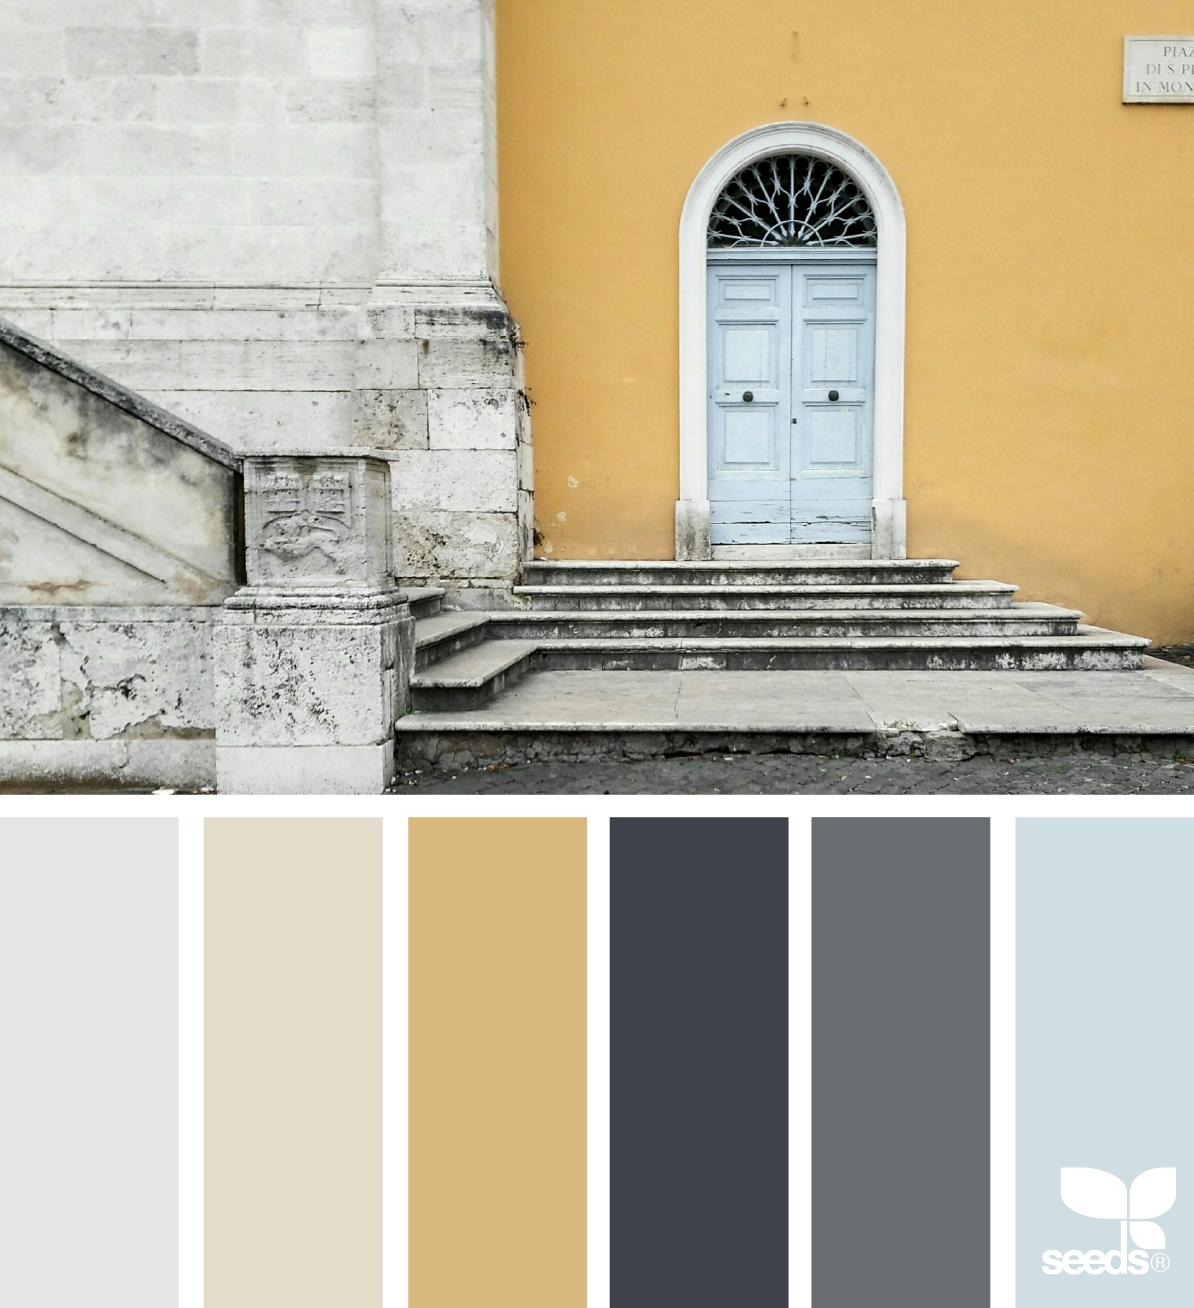 Df5411 esquemas de color casa exteriores con persianas negras - Depto